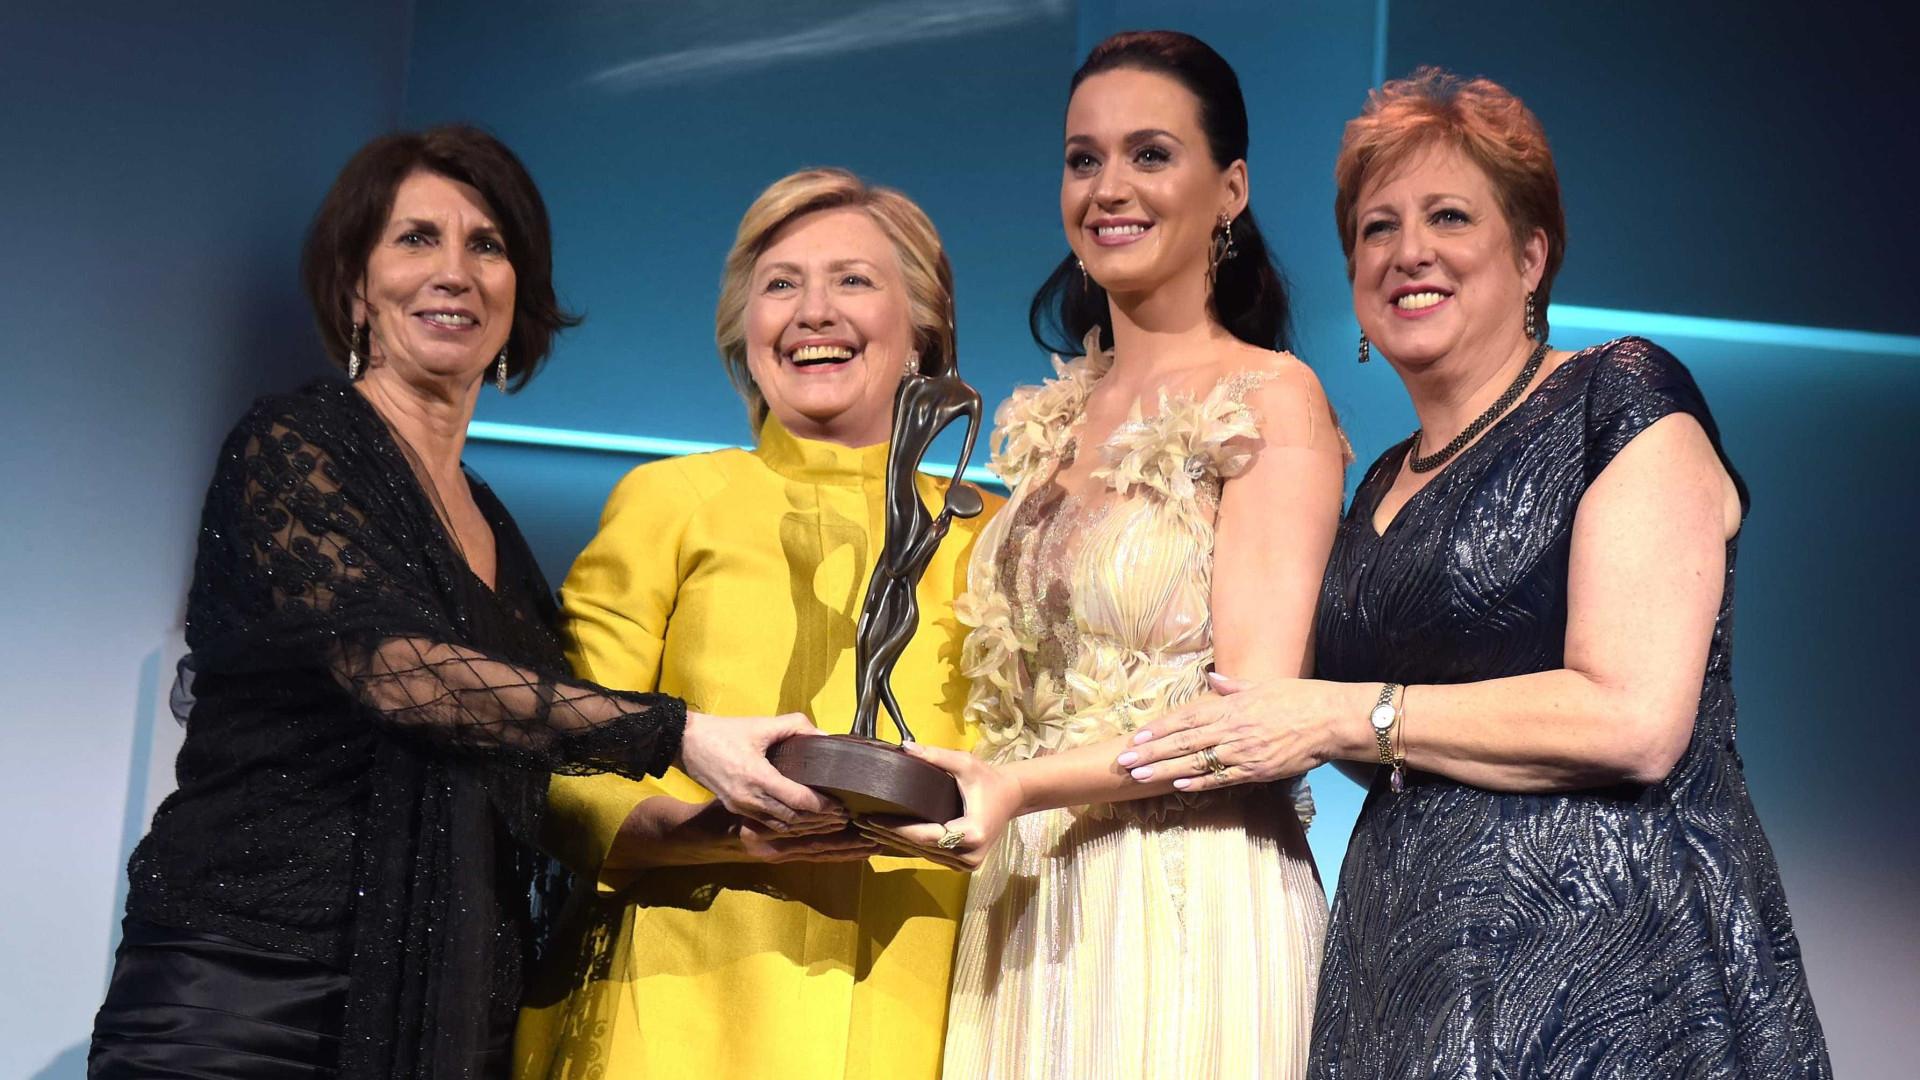 Hillary Clinton aparece de surpresa em entrega prêmio a Katy Perry